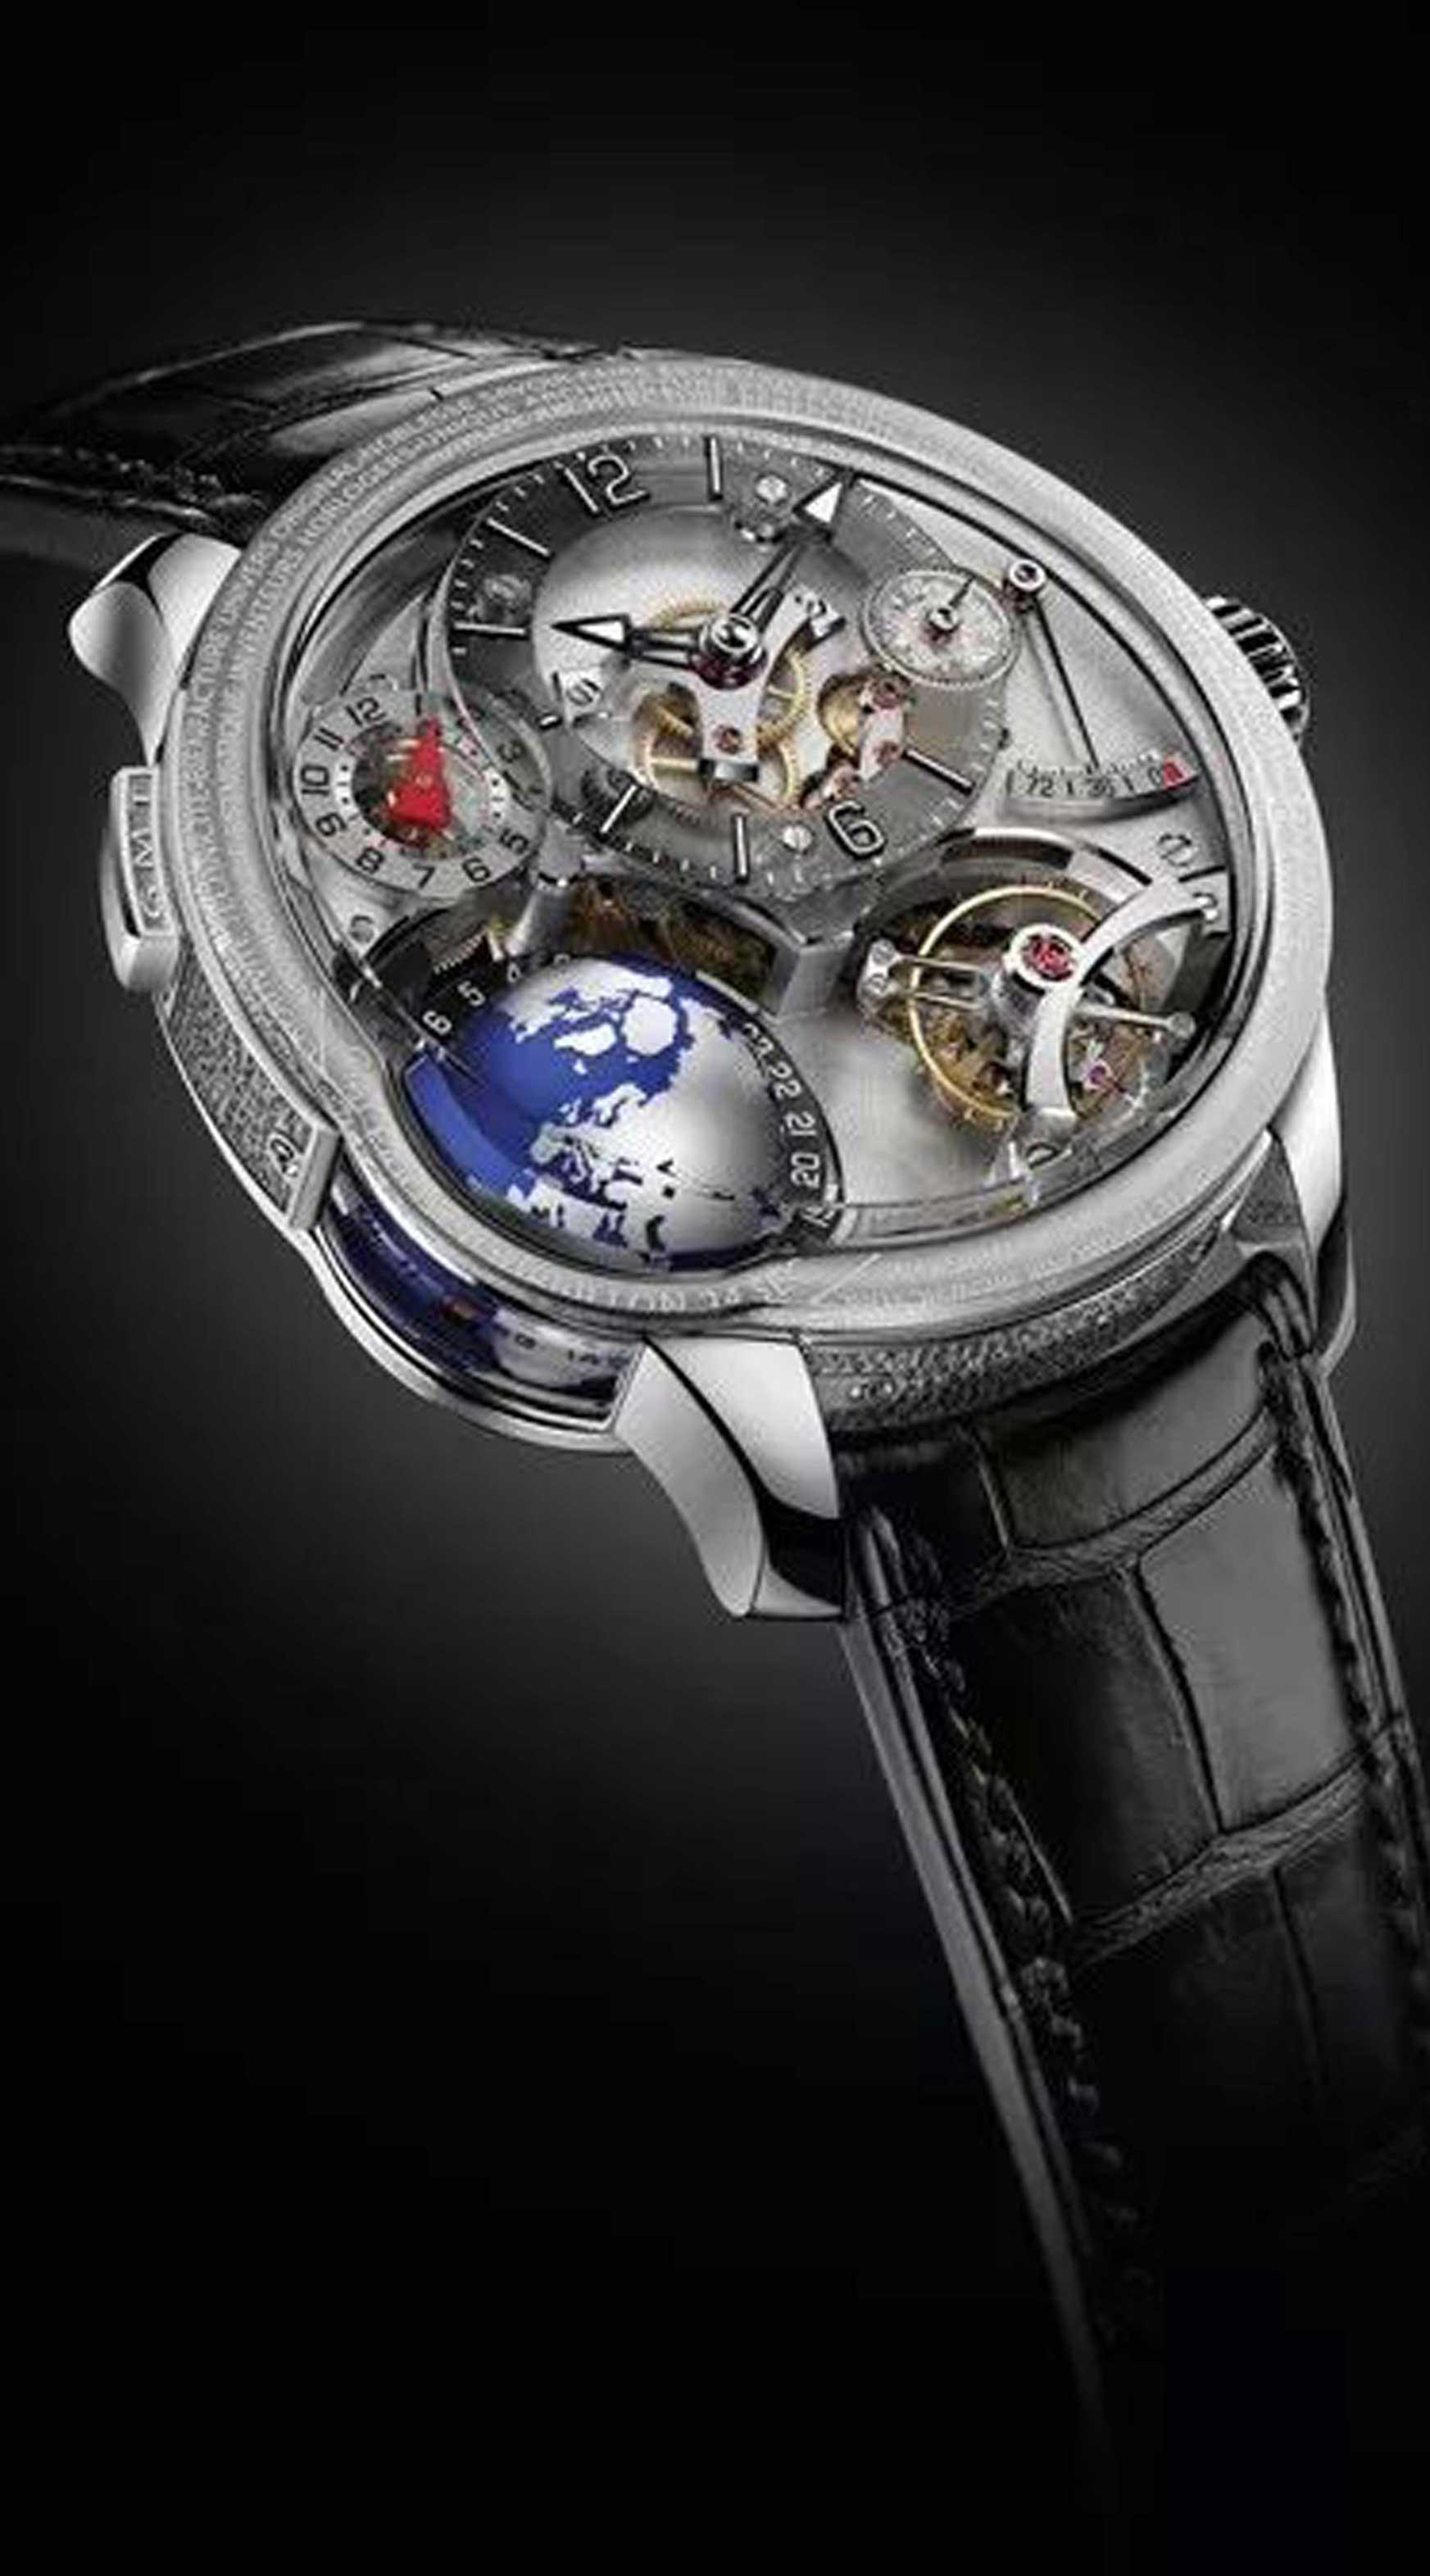 Onlylady2018SIHH高珀富斯GMT Earth腕表同时显示三个时区时间